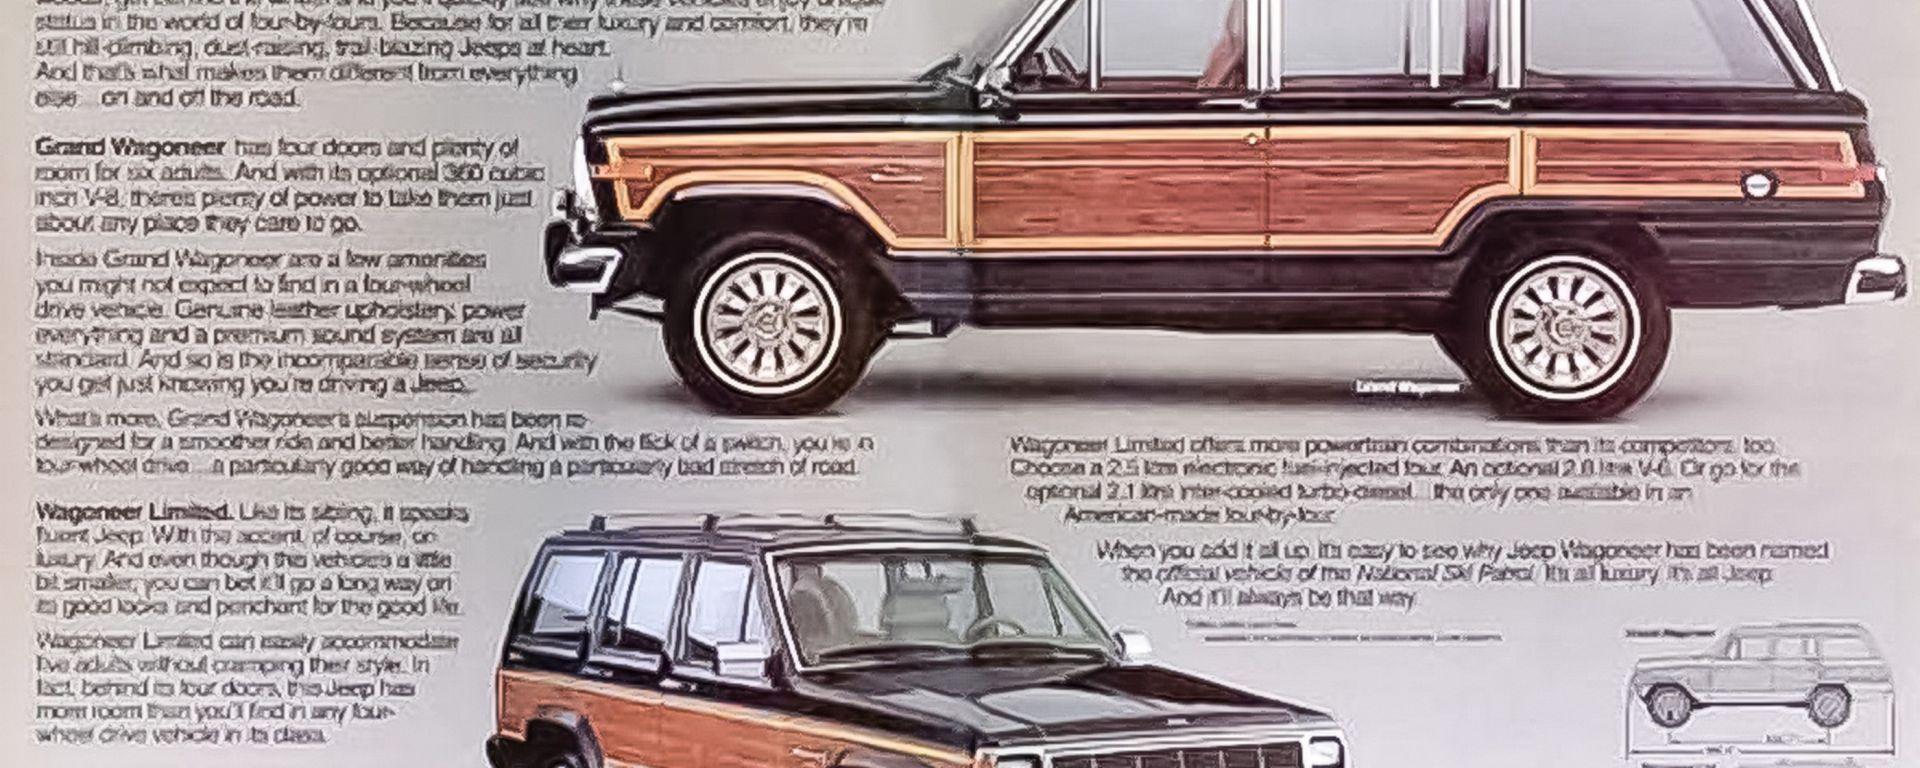 Jeep Wagoneer, l'ho comprata come e perché